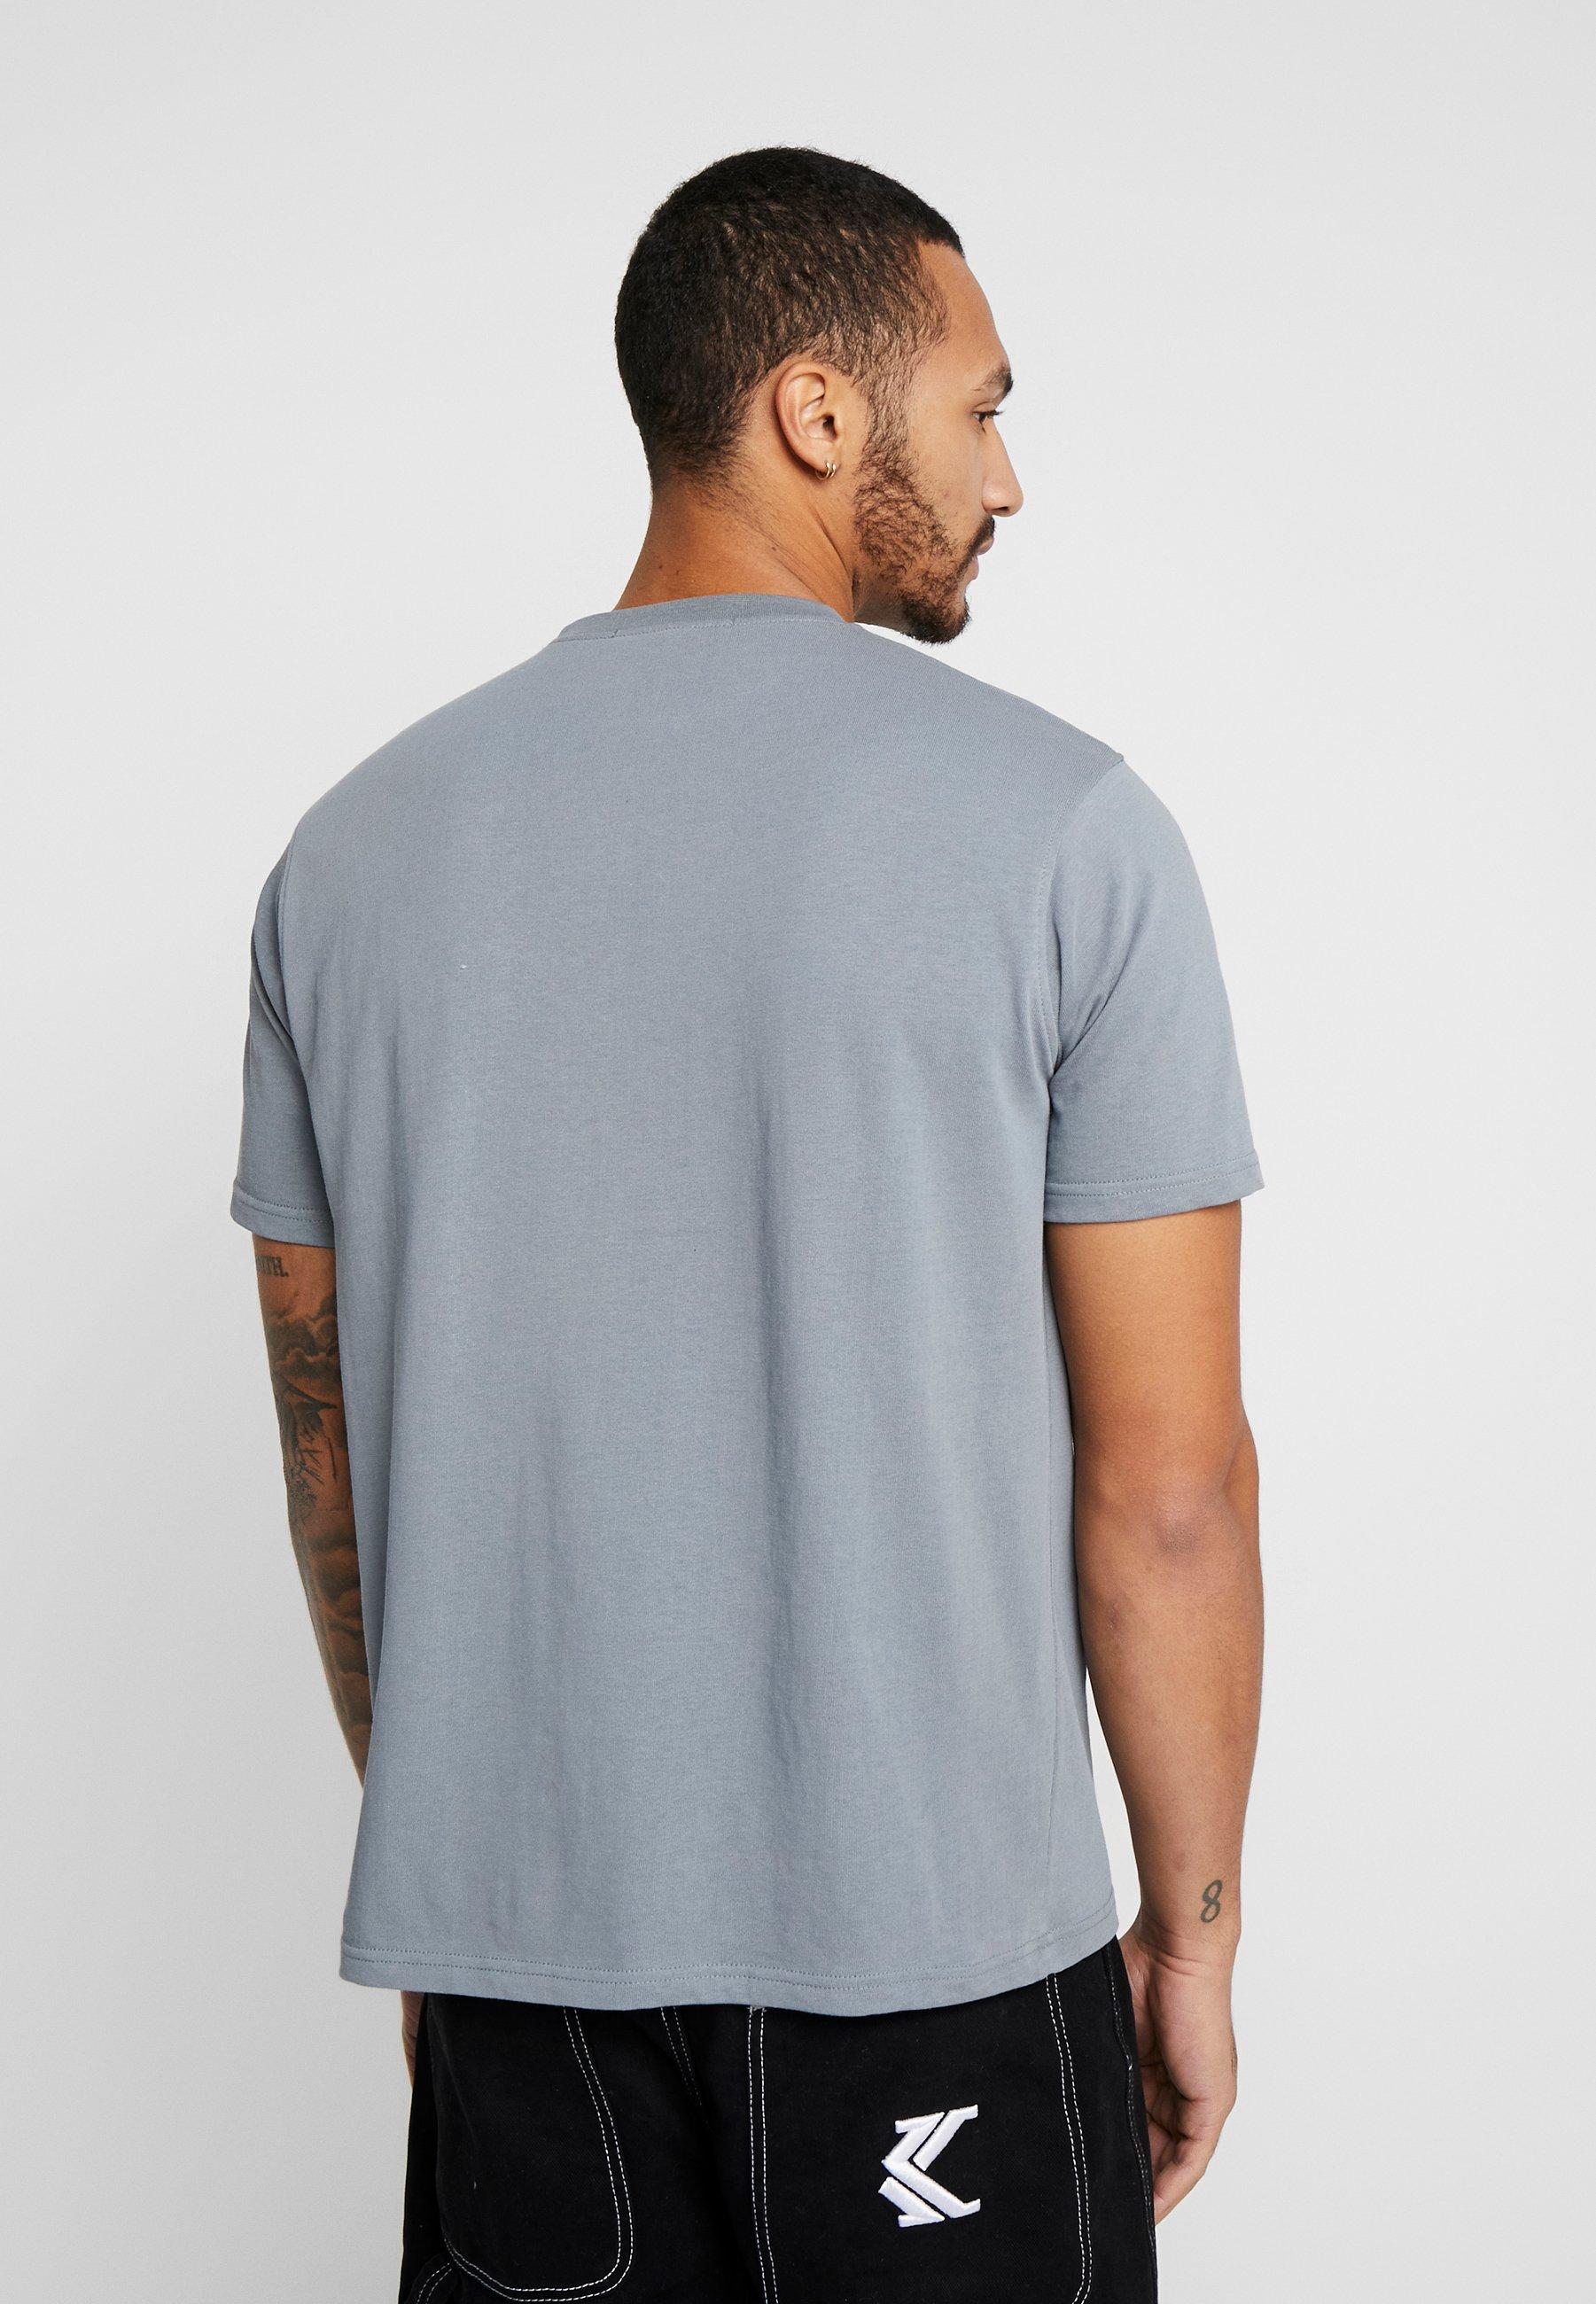 Mennace ESSENTIAL SIGNATURE  - Basic T-shirt - teal 0ApJH